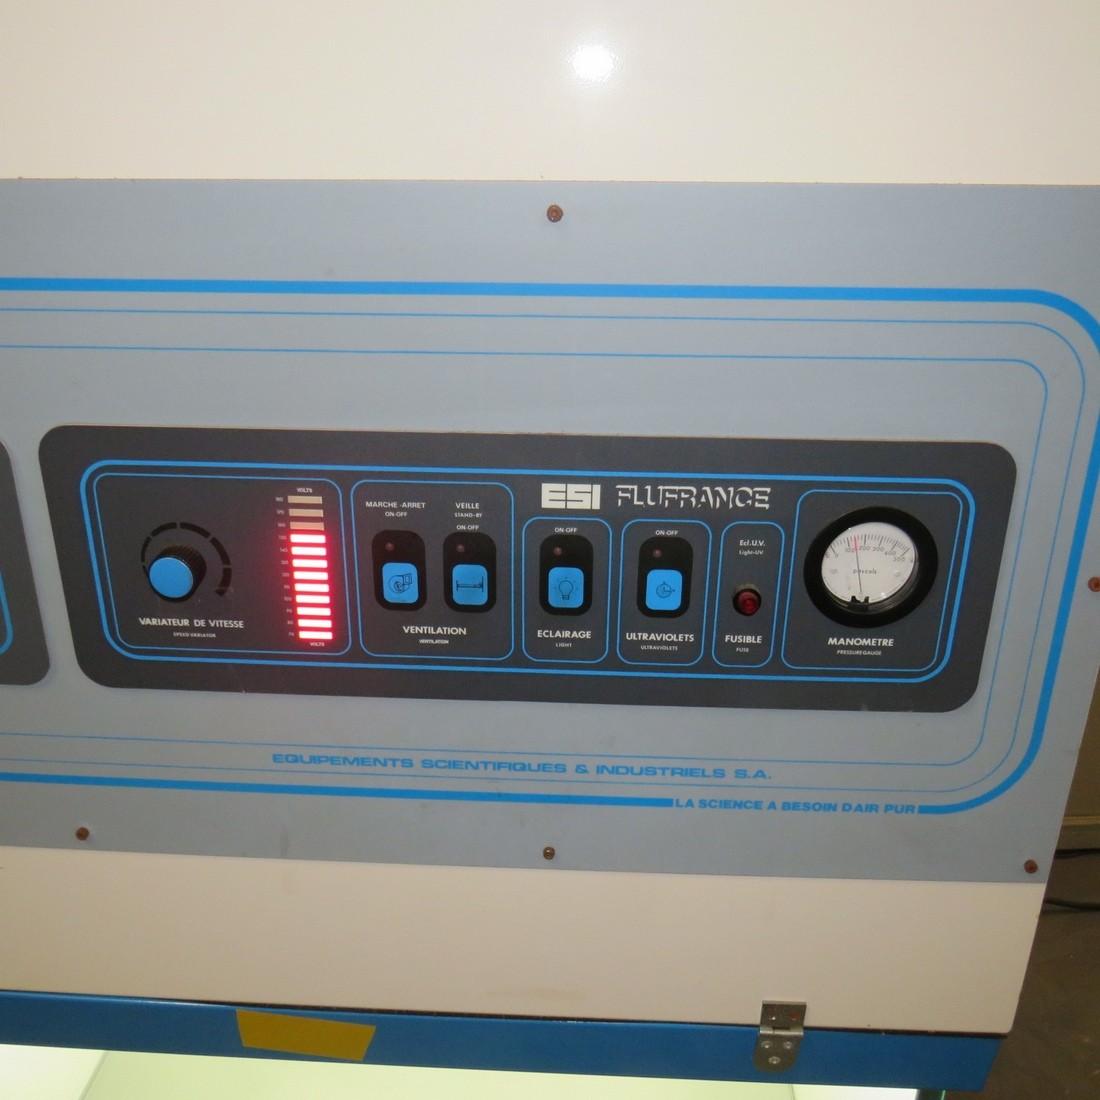 R1XB35 ESI FLUFRANCE Laminair flow hood